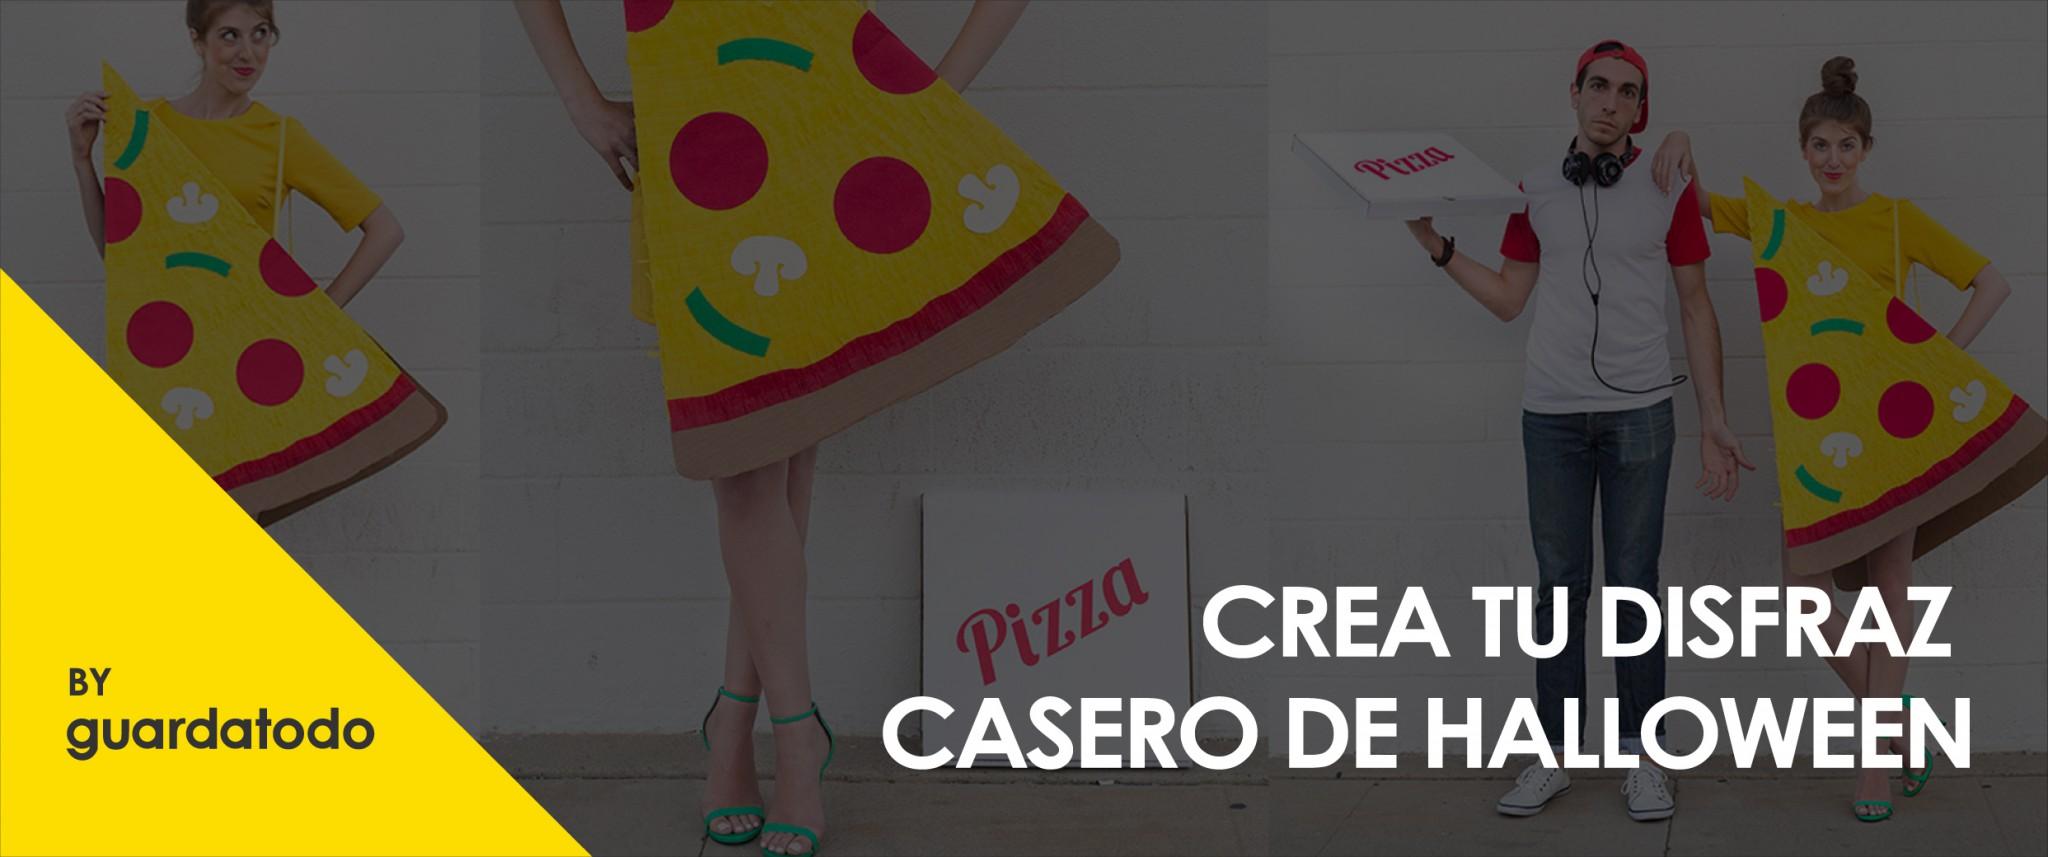 DISFRAZ CASERO DE HALLOWEEN-01